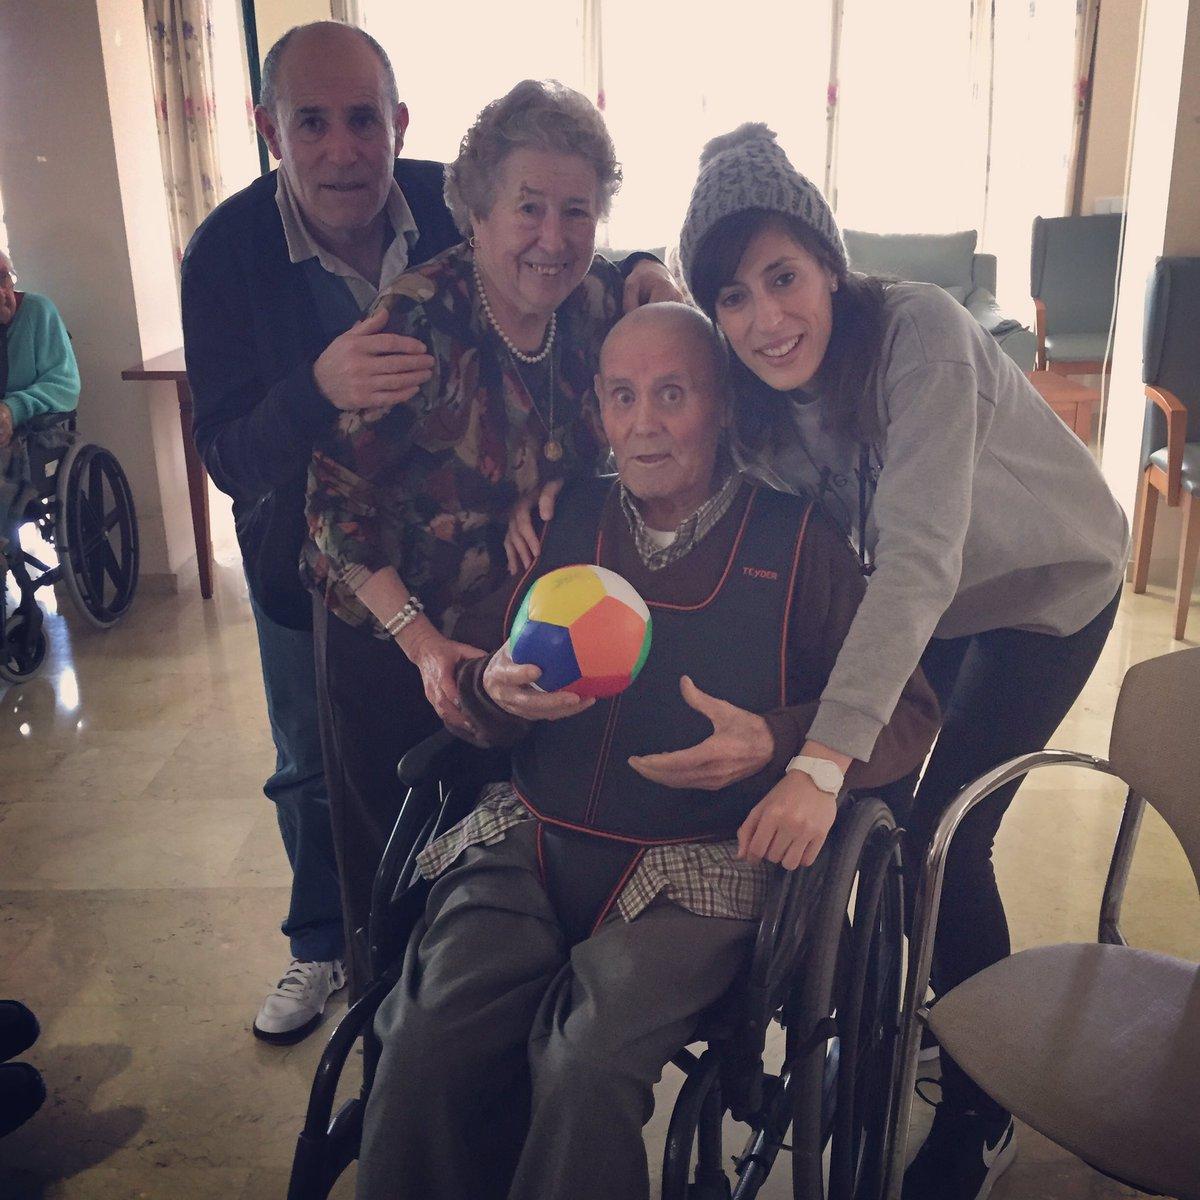 ¿Jugamos? #Abuelos #Familia #Tiramelapelota #Feliz #Love  Febrero 2017 <br>http://pic.twitter.com/JKGJOPCk0b